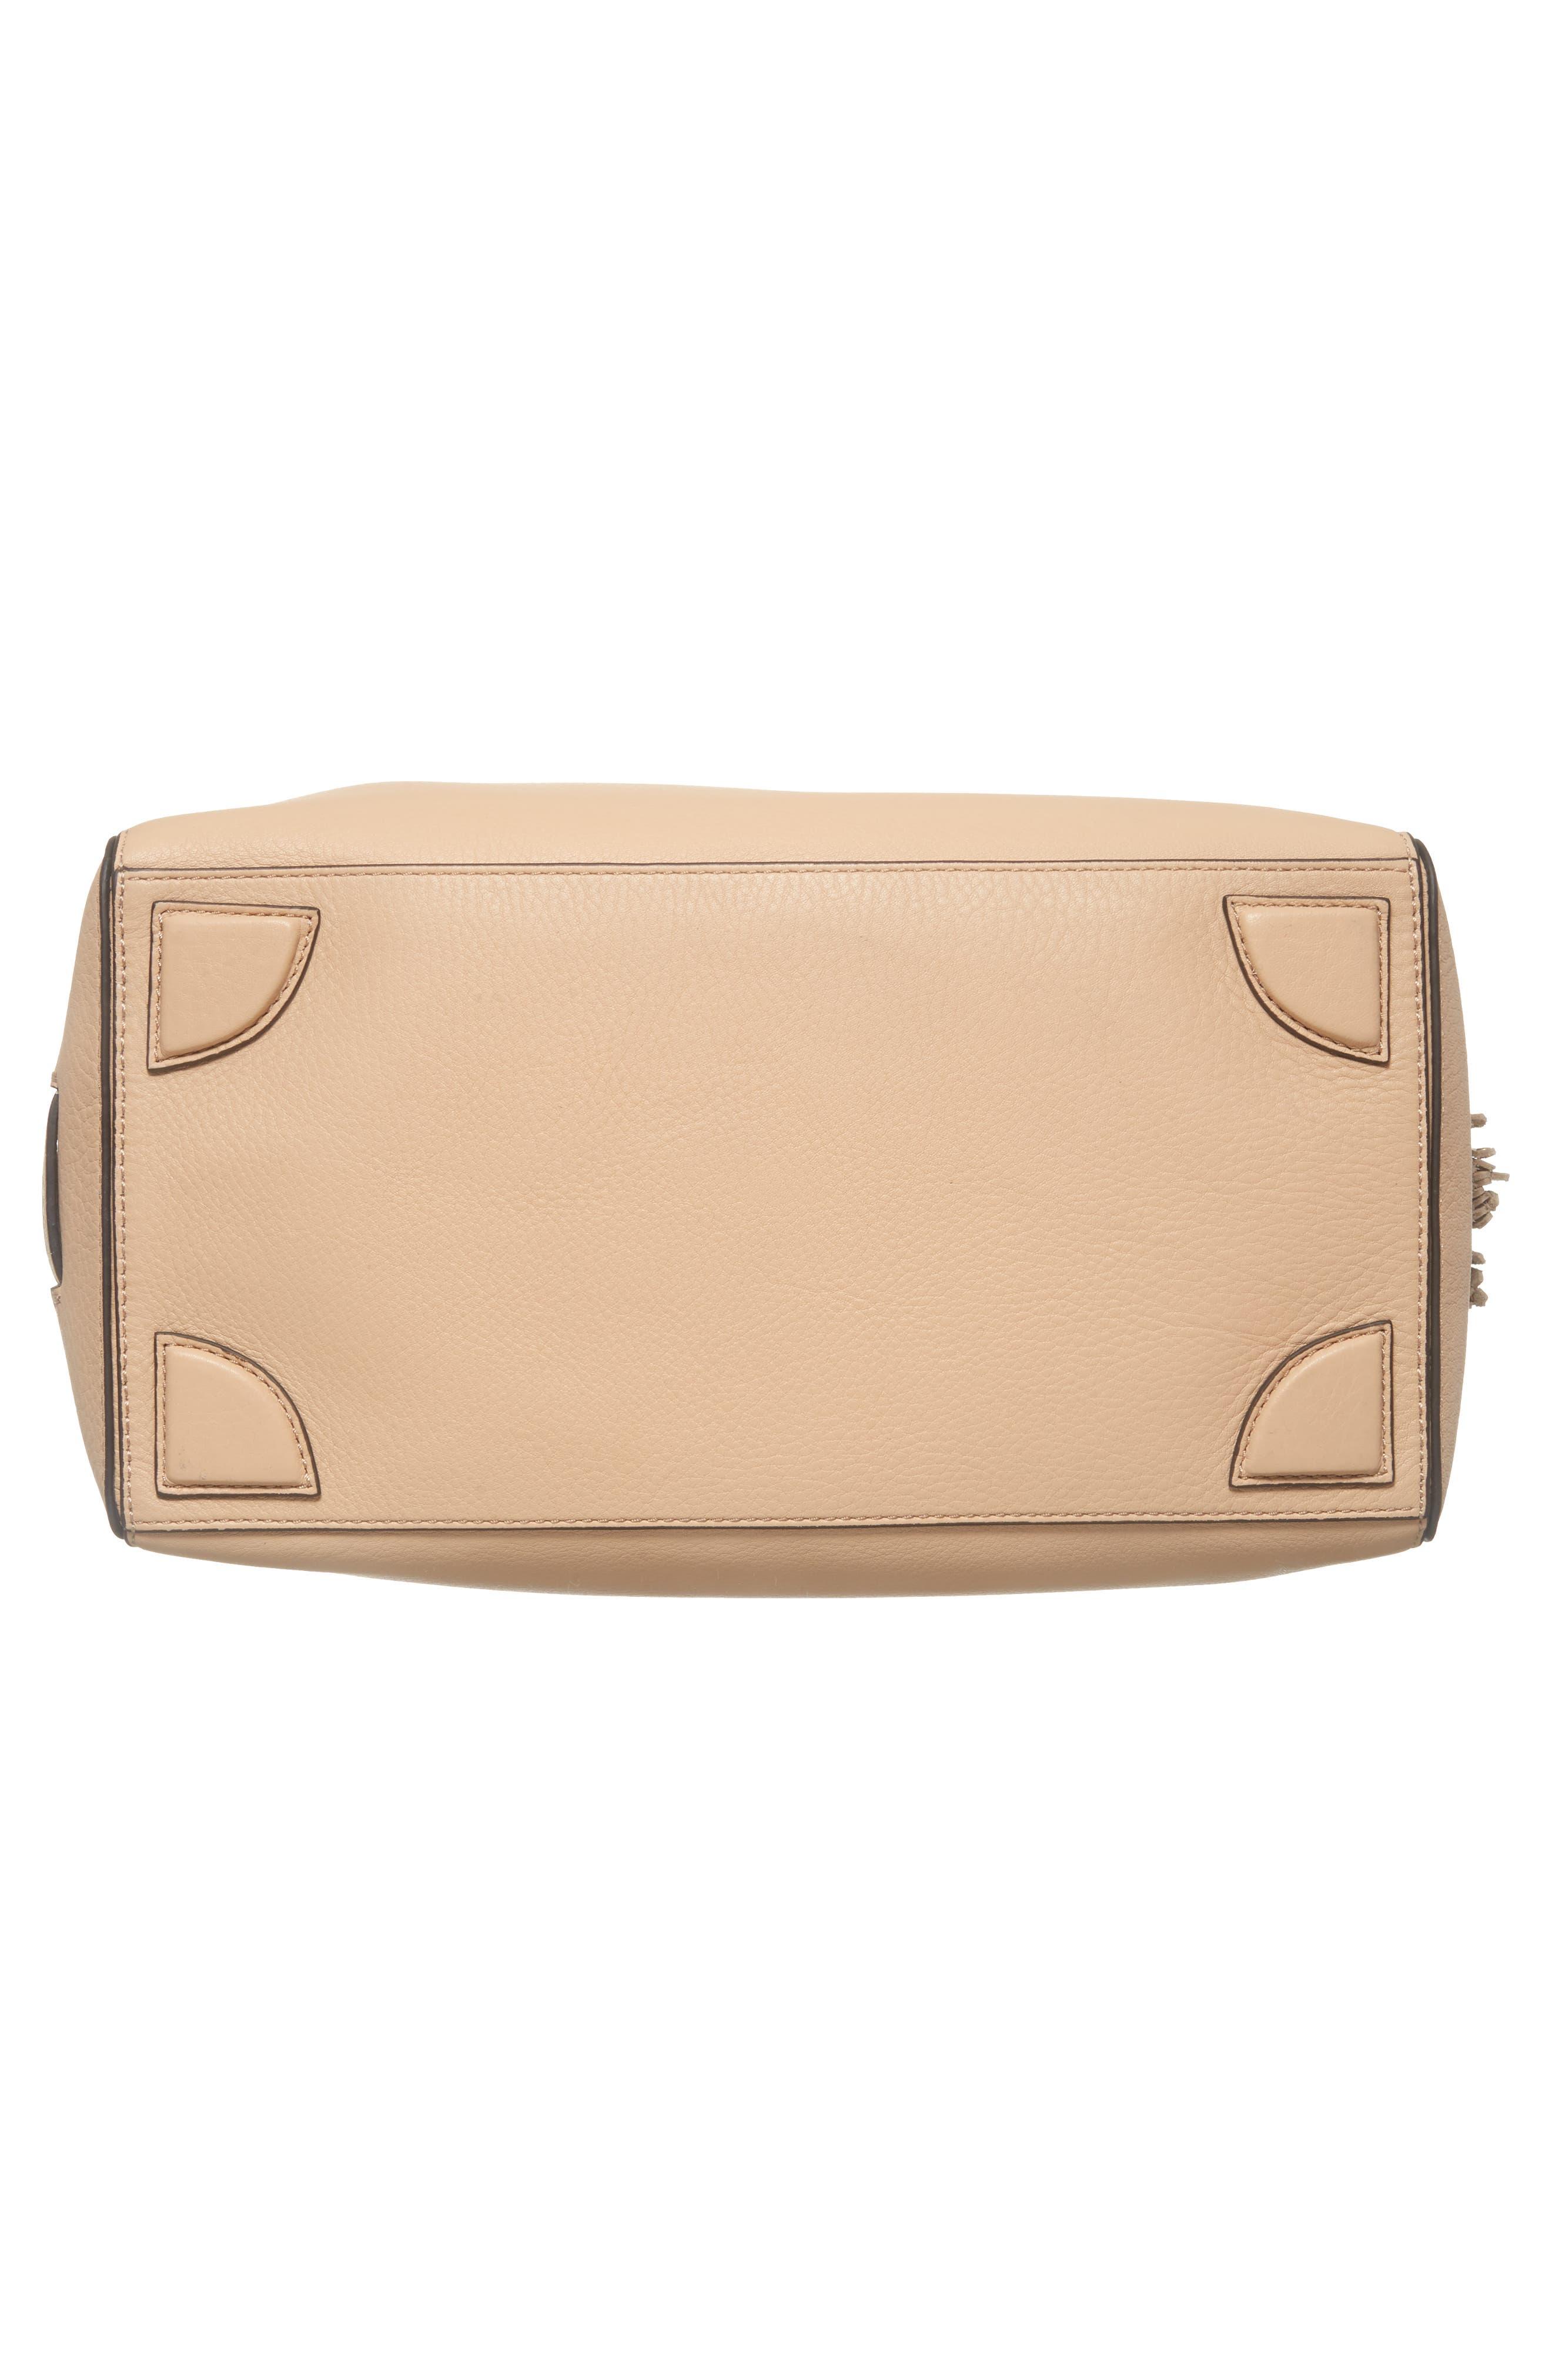 Cassidy RFID Pebbled Leather Bucket Bag,                             Alternate thumbnail 23, color,